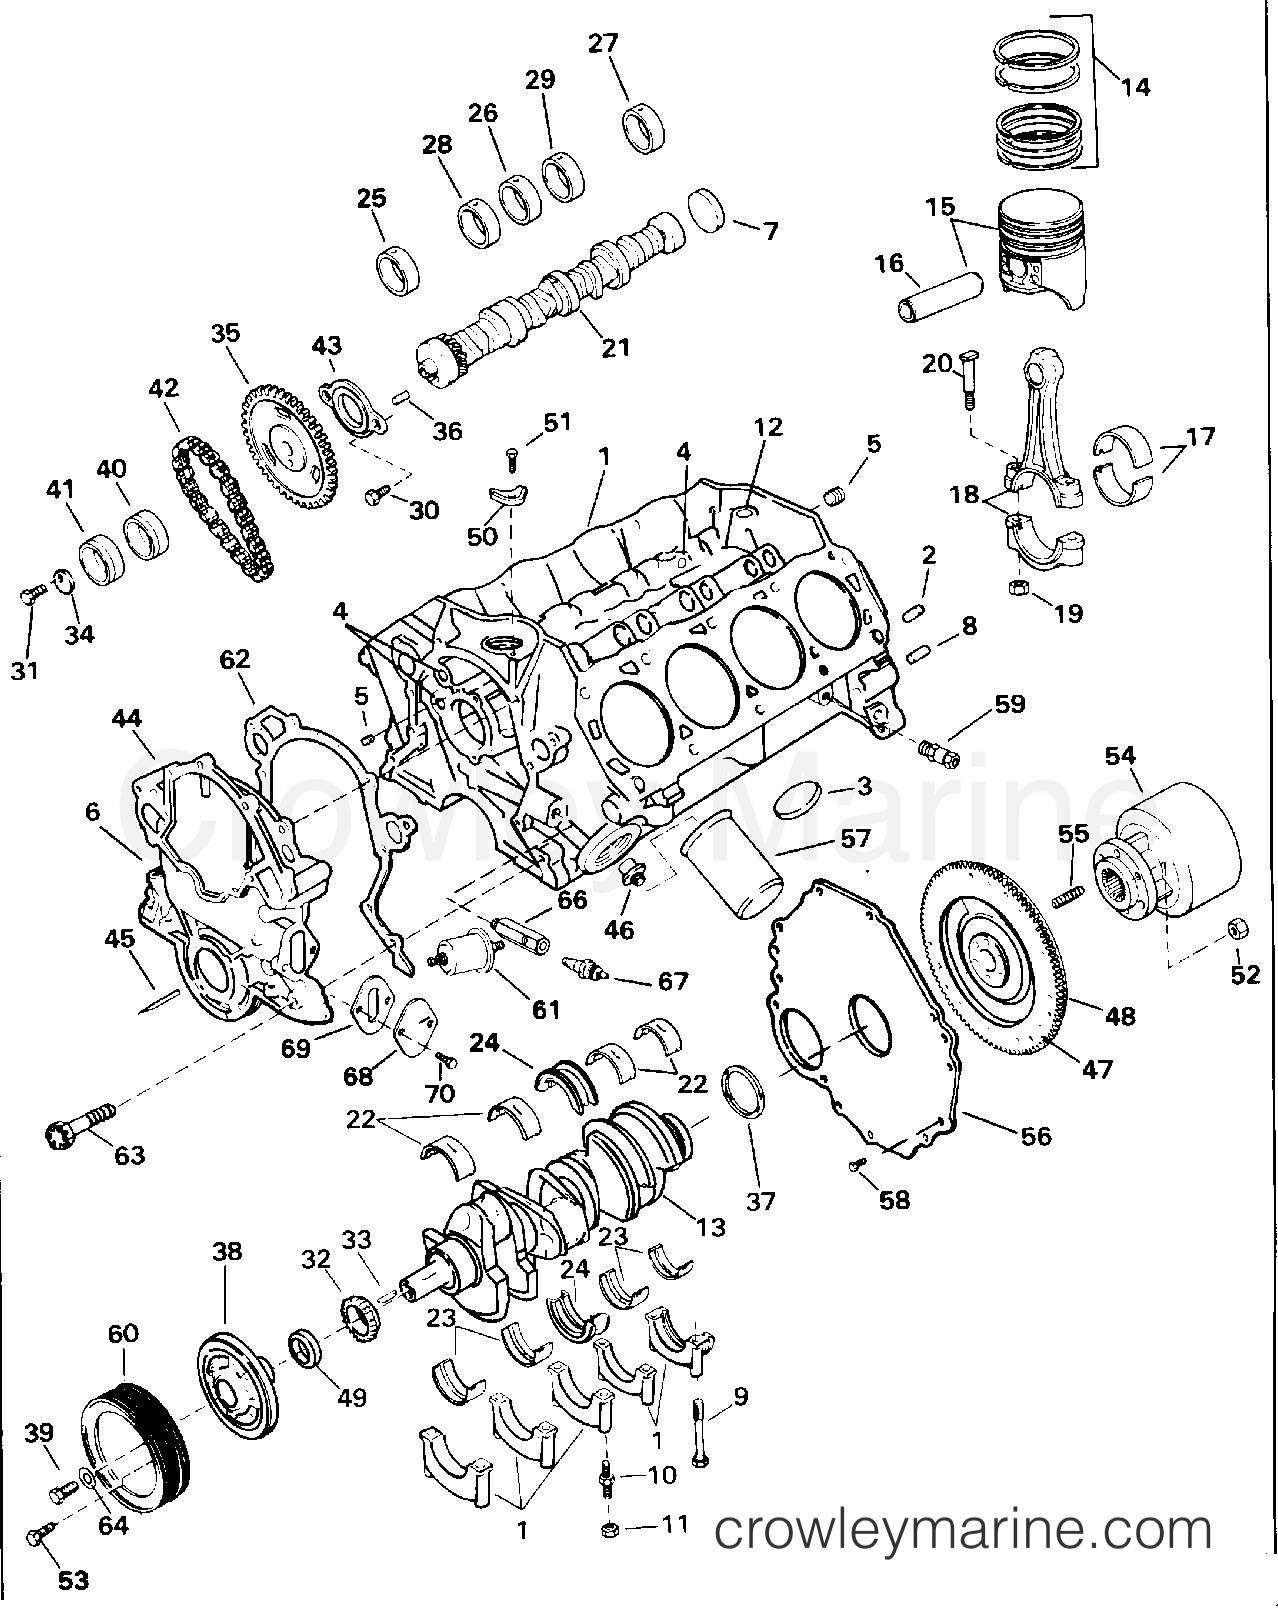 1994 OMC Stern Drive 5.8 - 58FAGPMDM - CRANKCASE - 5.8 LITRE